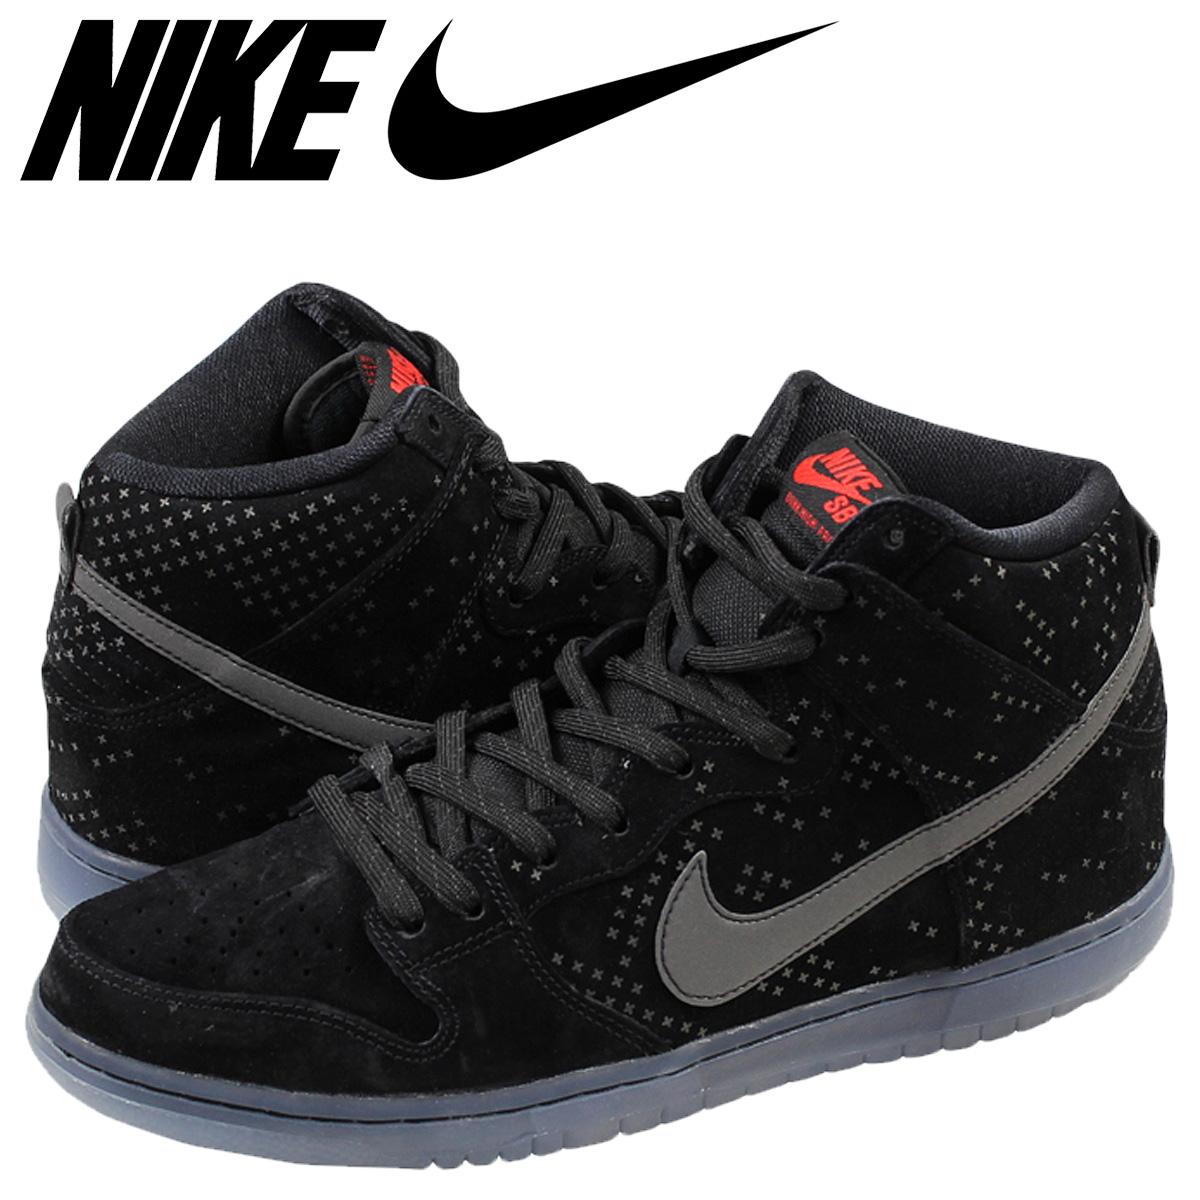 huge discount 6d95e 6c9e2 ... buy nike nike dunk sneakers premier x sb flash pack dunk hi dunk high  flash pack